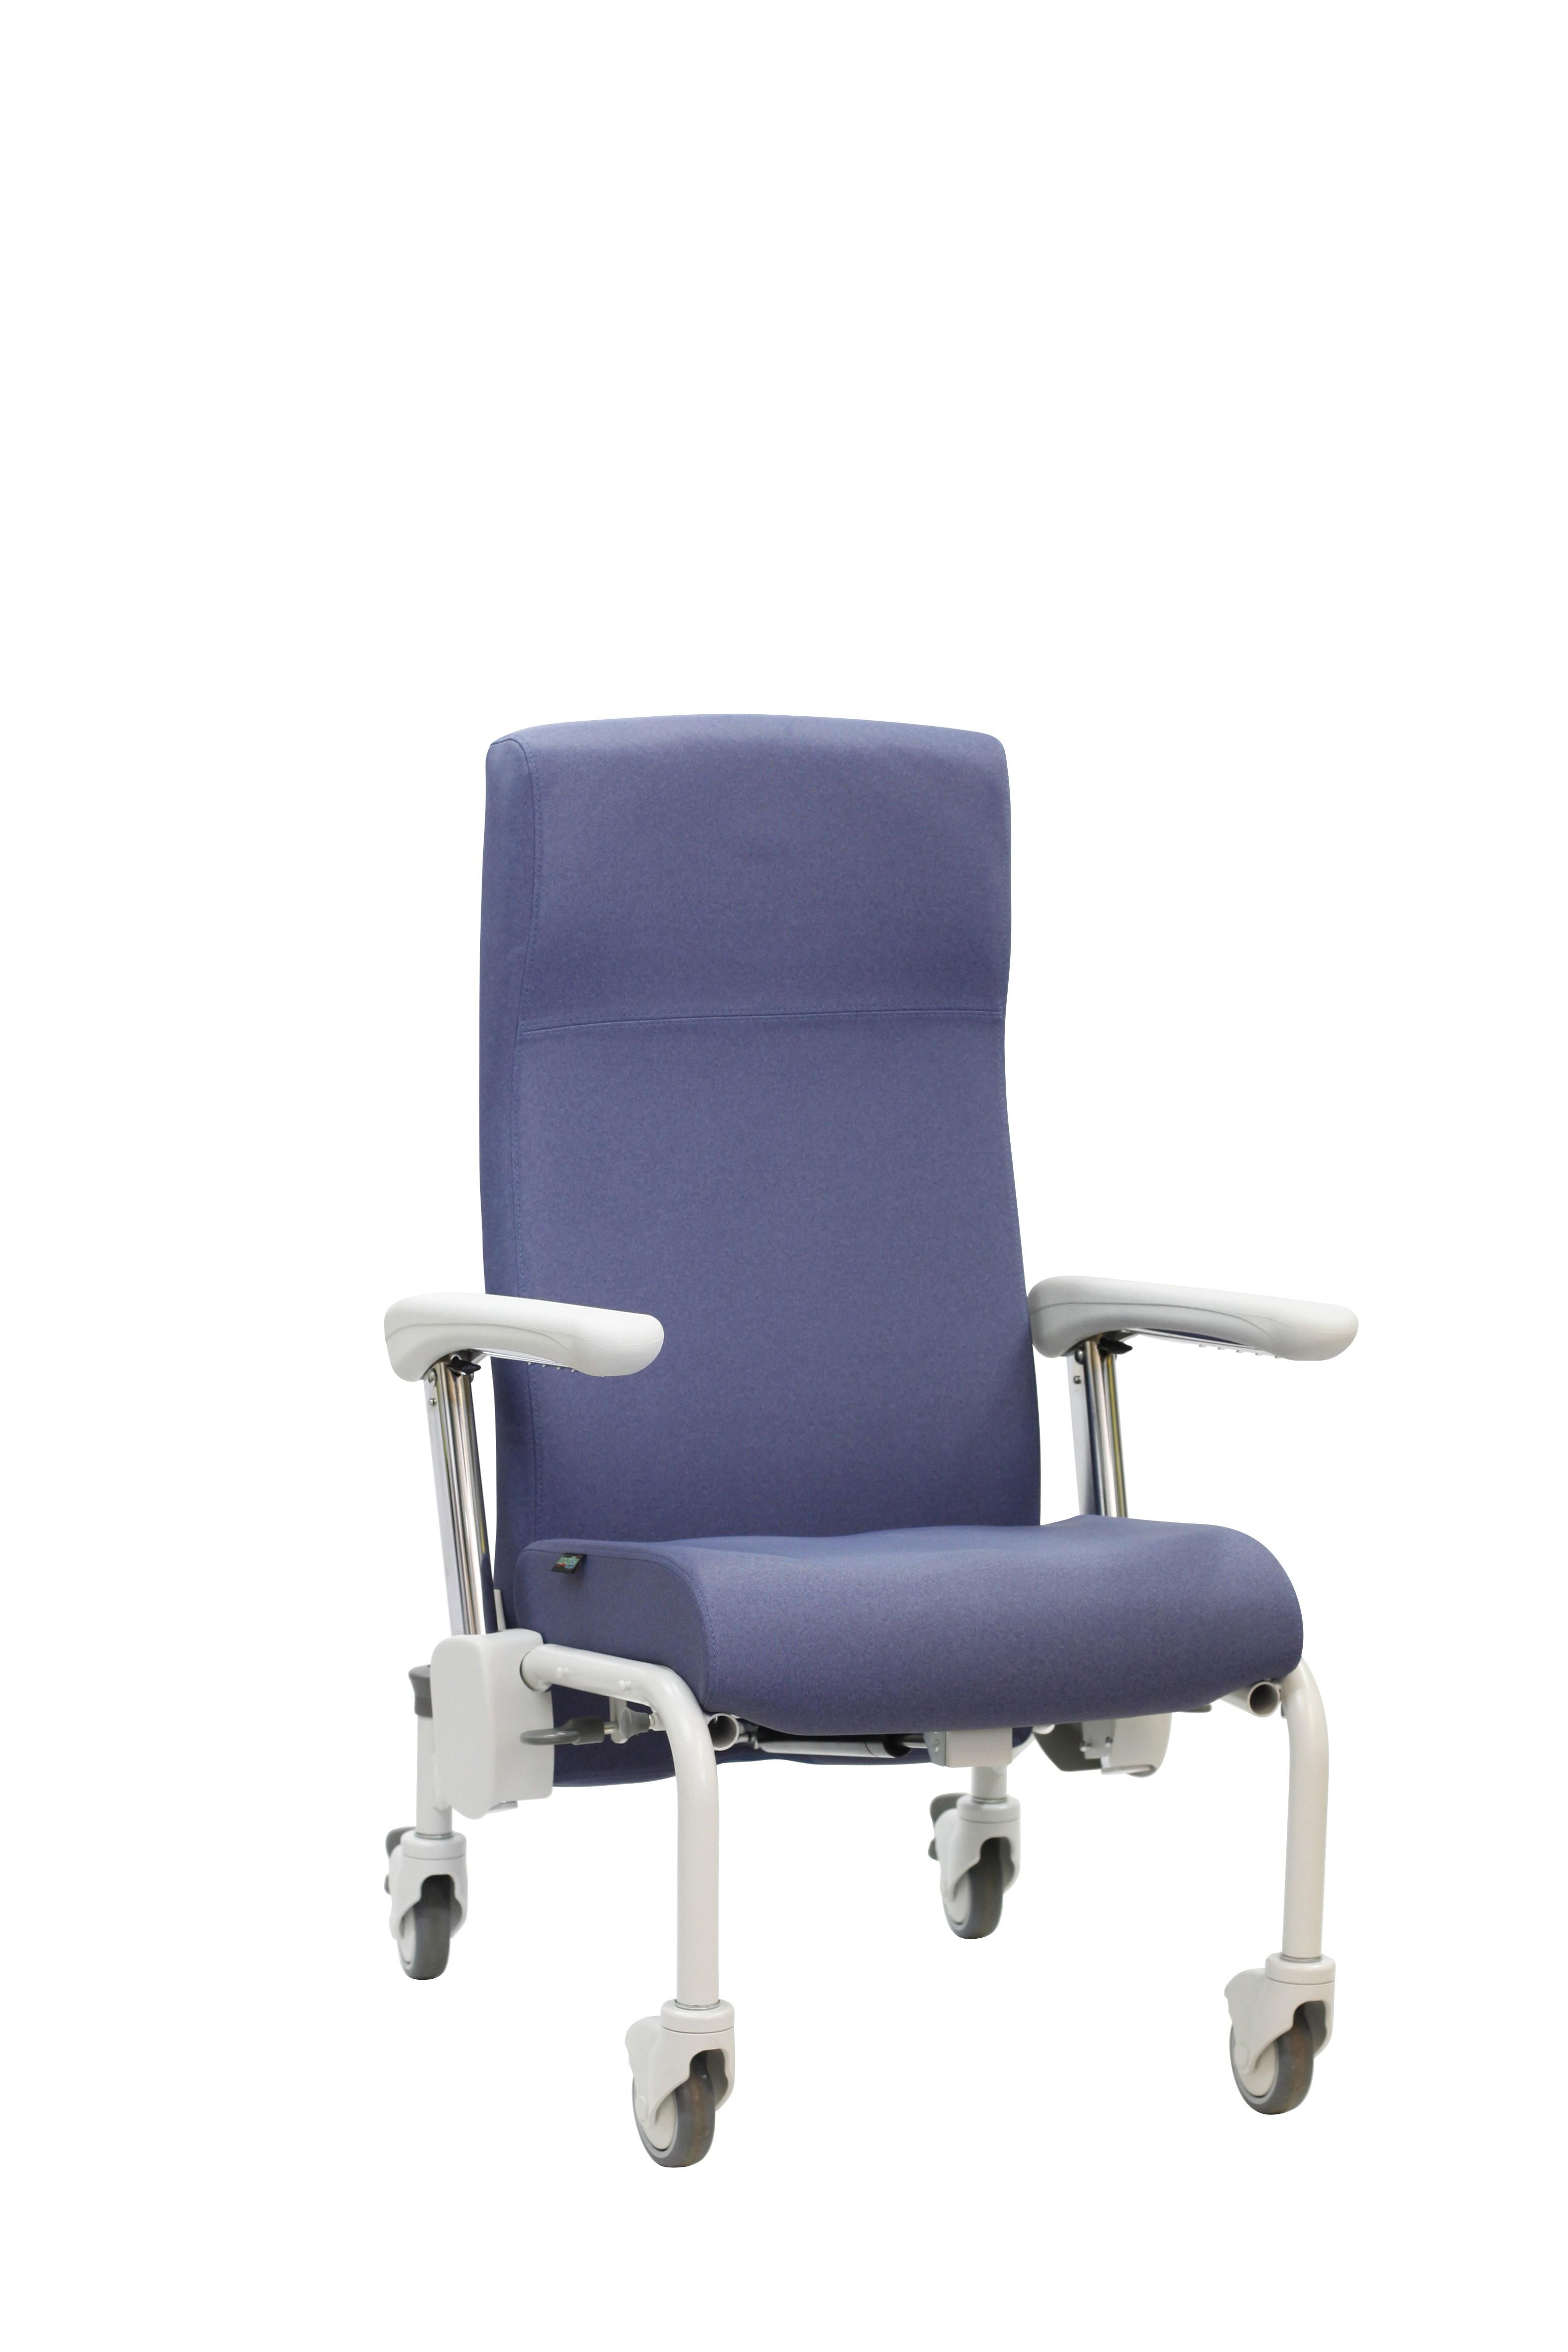 fauteuil de transfert m dicalis ergo 39 styl de sotec m dical. Black Bedroom Furniture Sets. Home Design Ideas